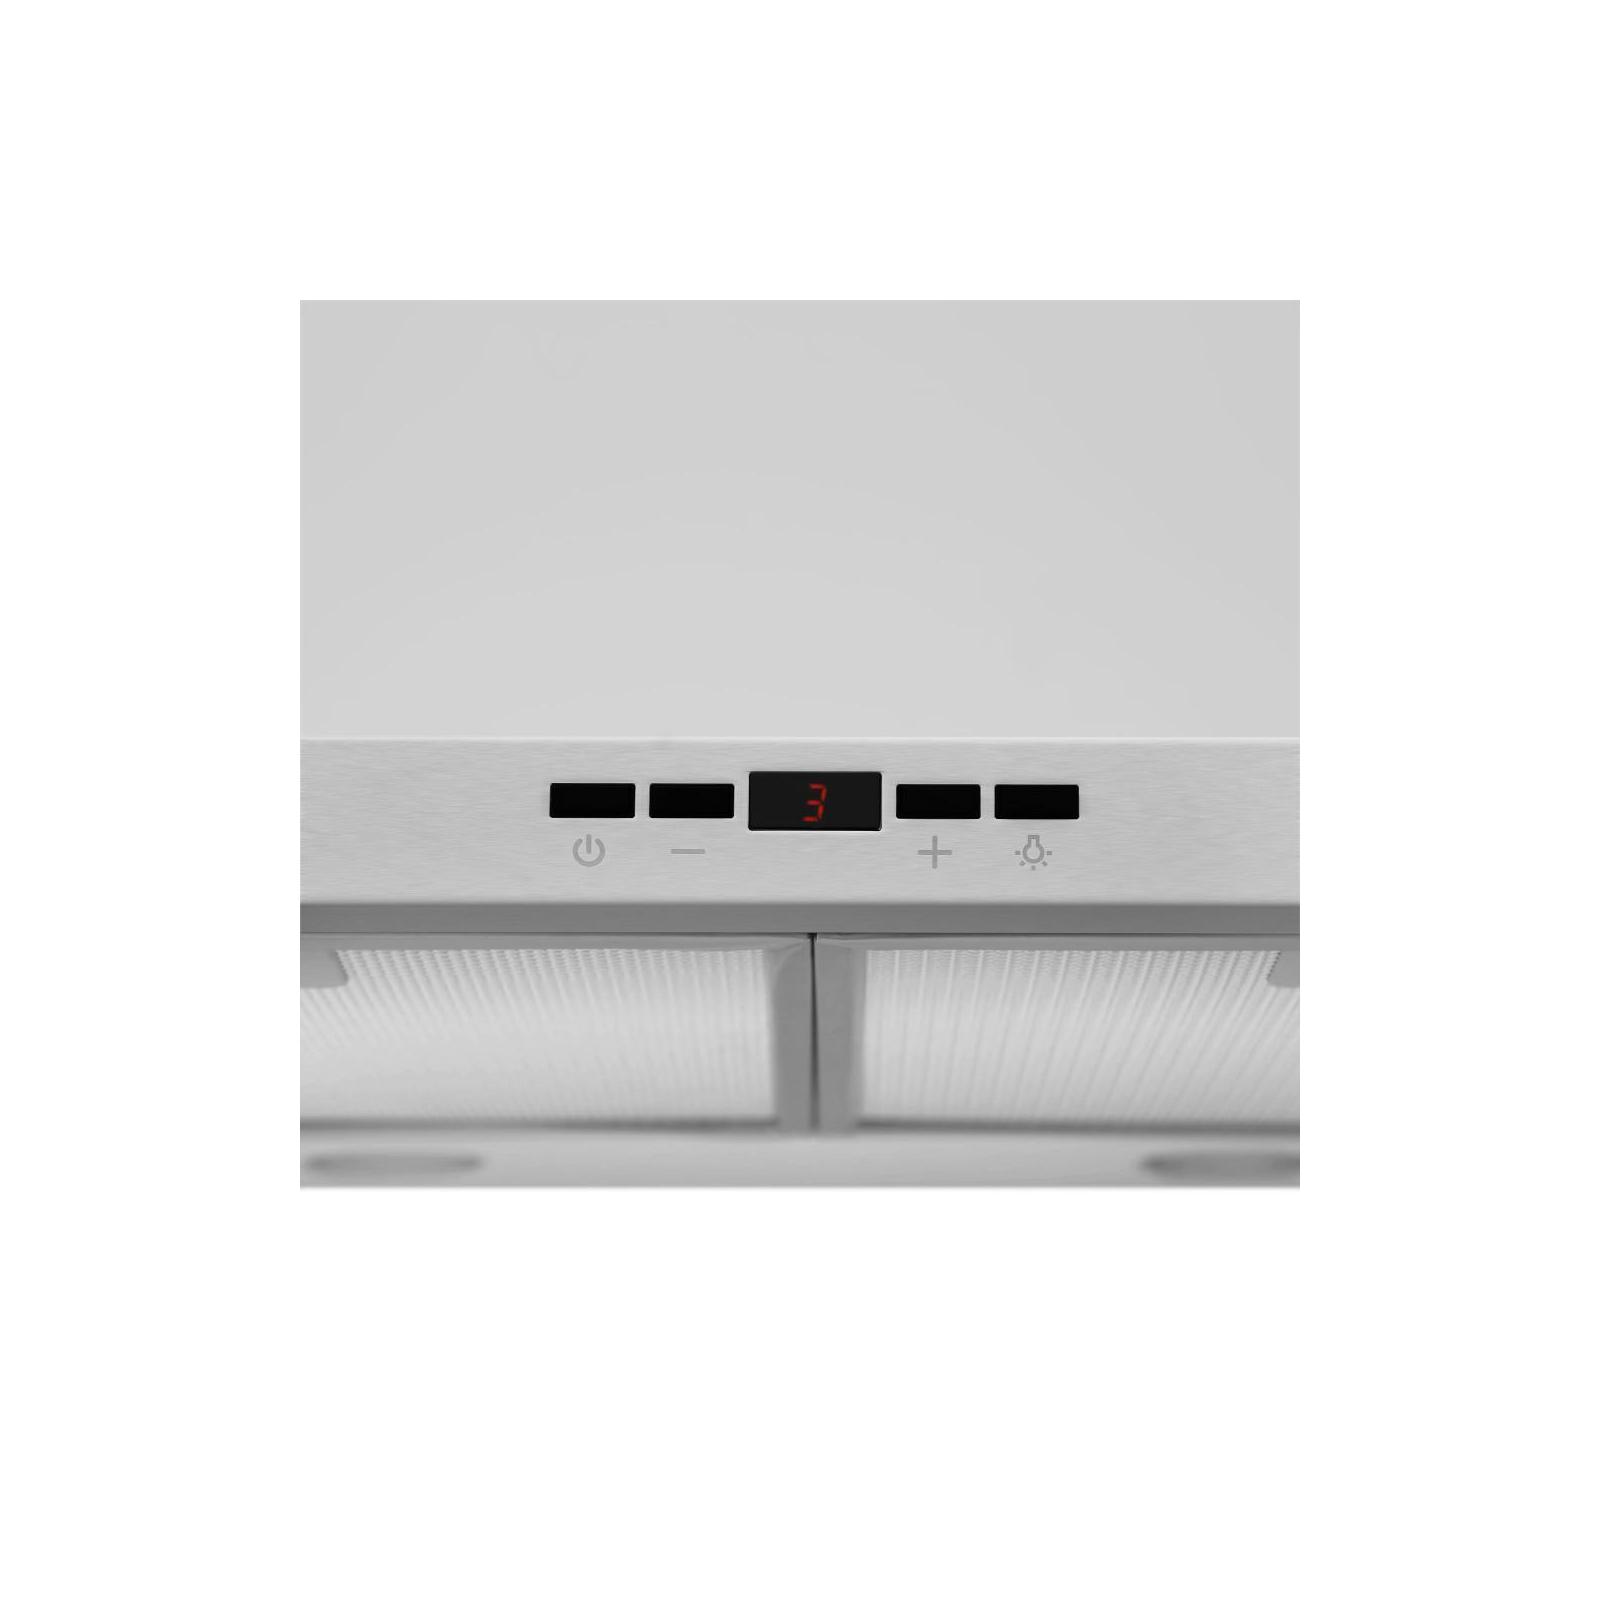 Вытяжка кухонная PERFELLI TET 6612 A 1000 I LED изображение 4